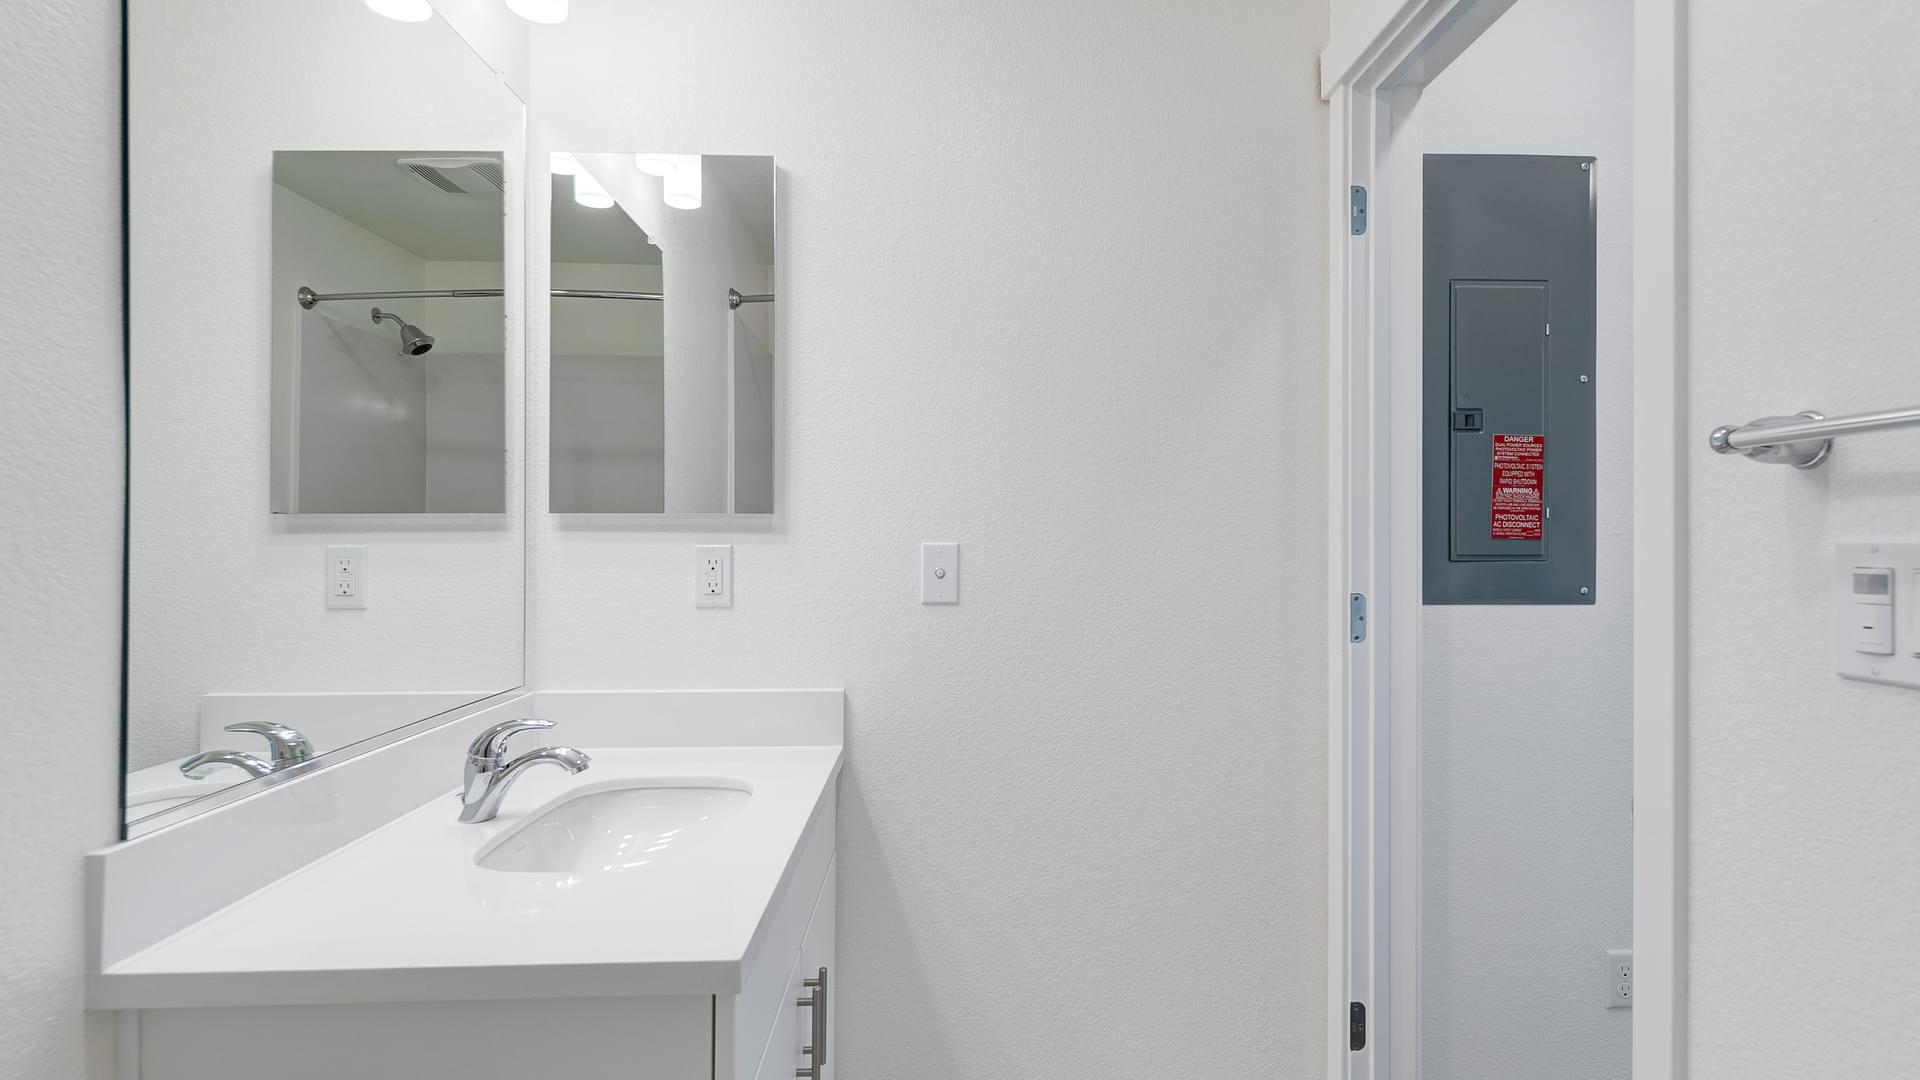 Residence 6 Bath 2